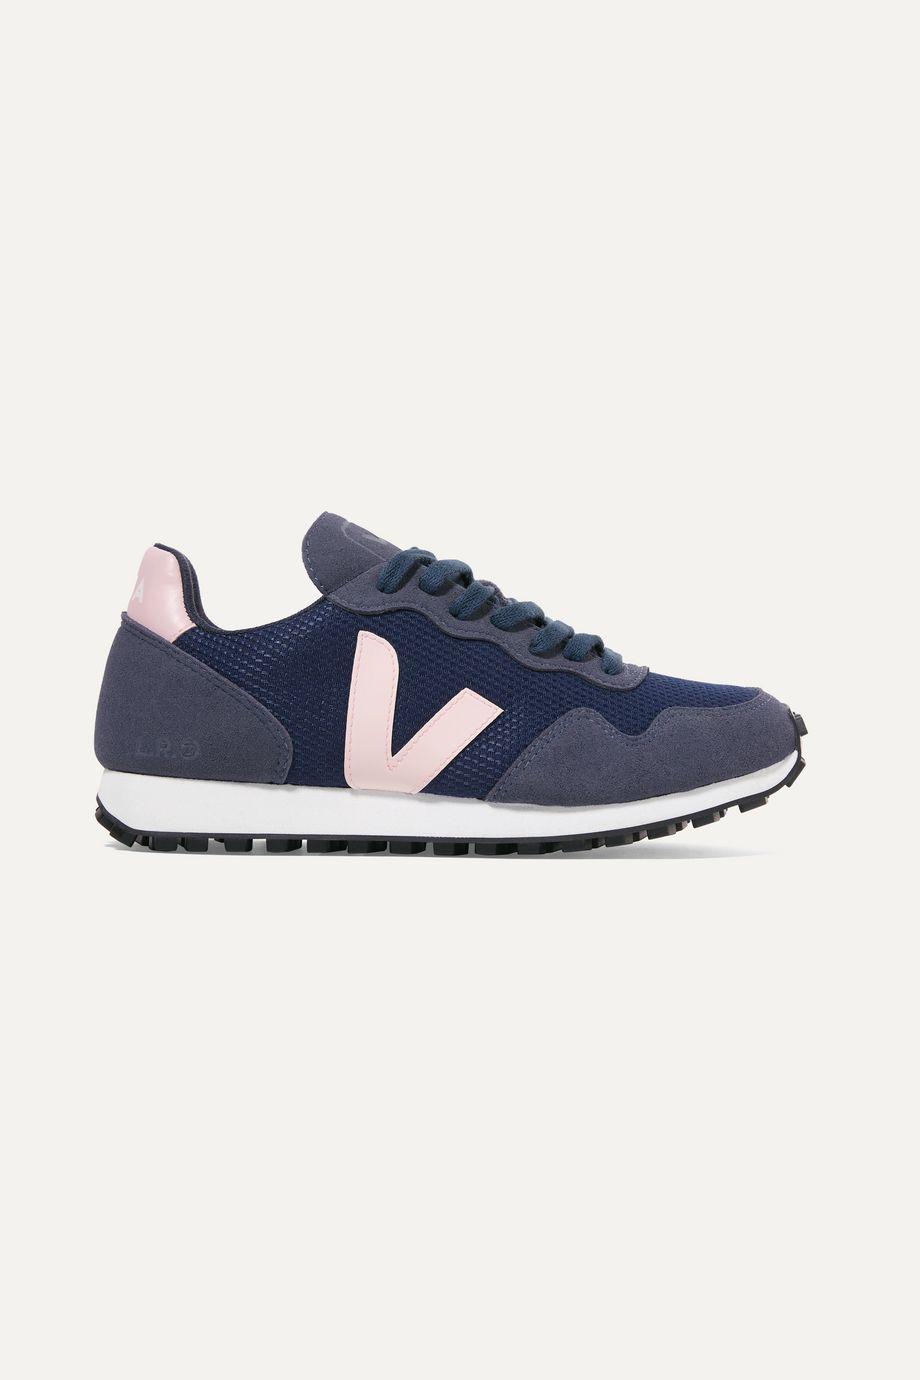 Veja + NET SUSTAIN SDU REC vegan suede and mesh sneakers